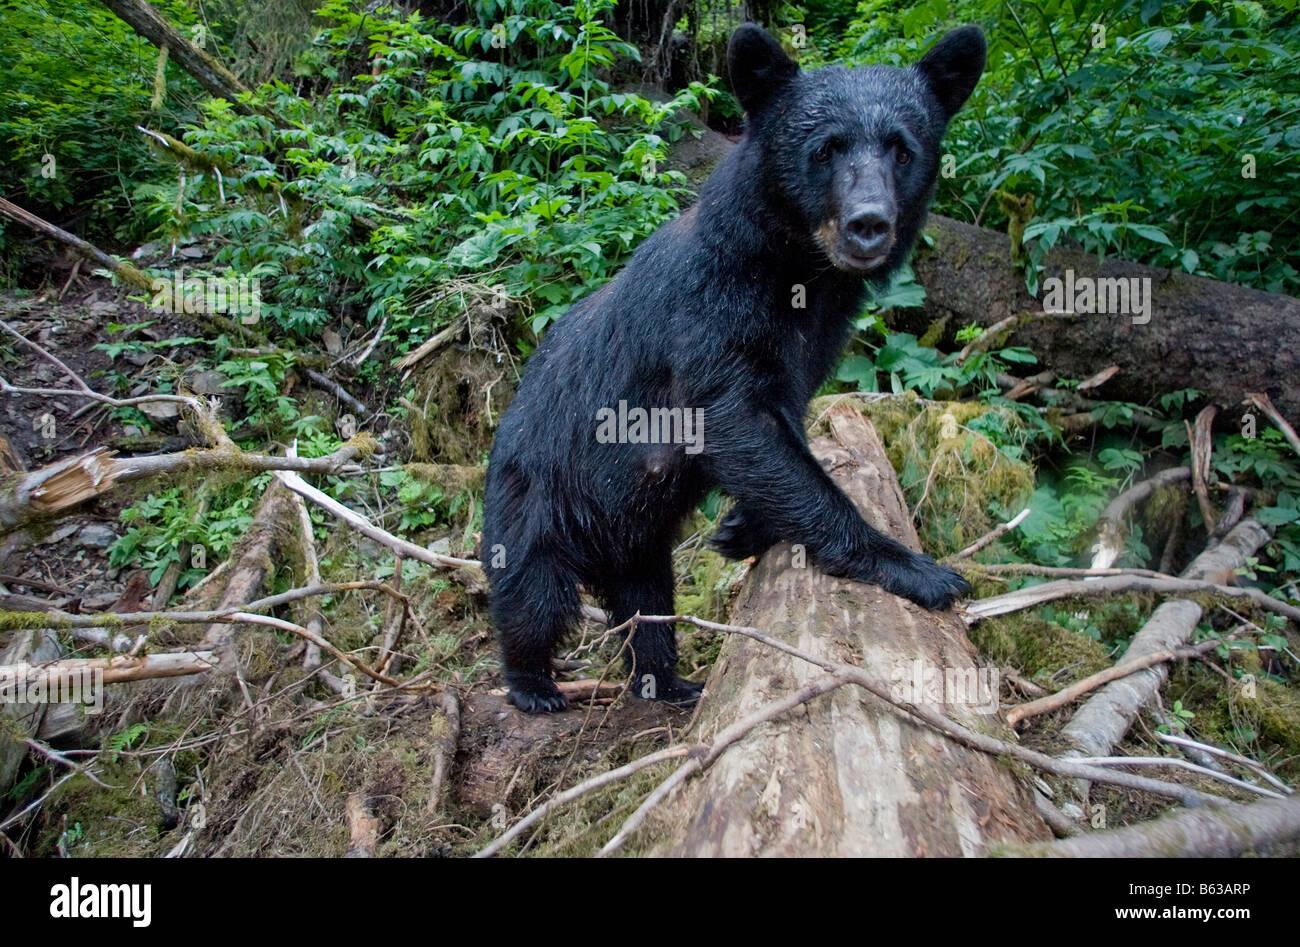 USA Alaska Kake Remote camera view of Black Bear Ursus americanus walking through rainforest near Gunnuk Creek - Stock Image